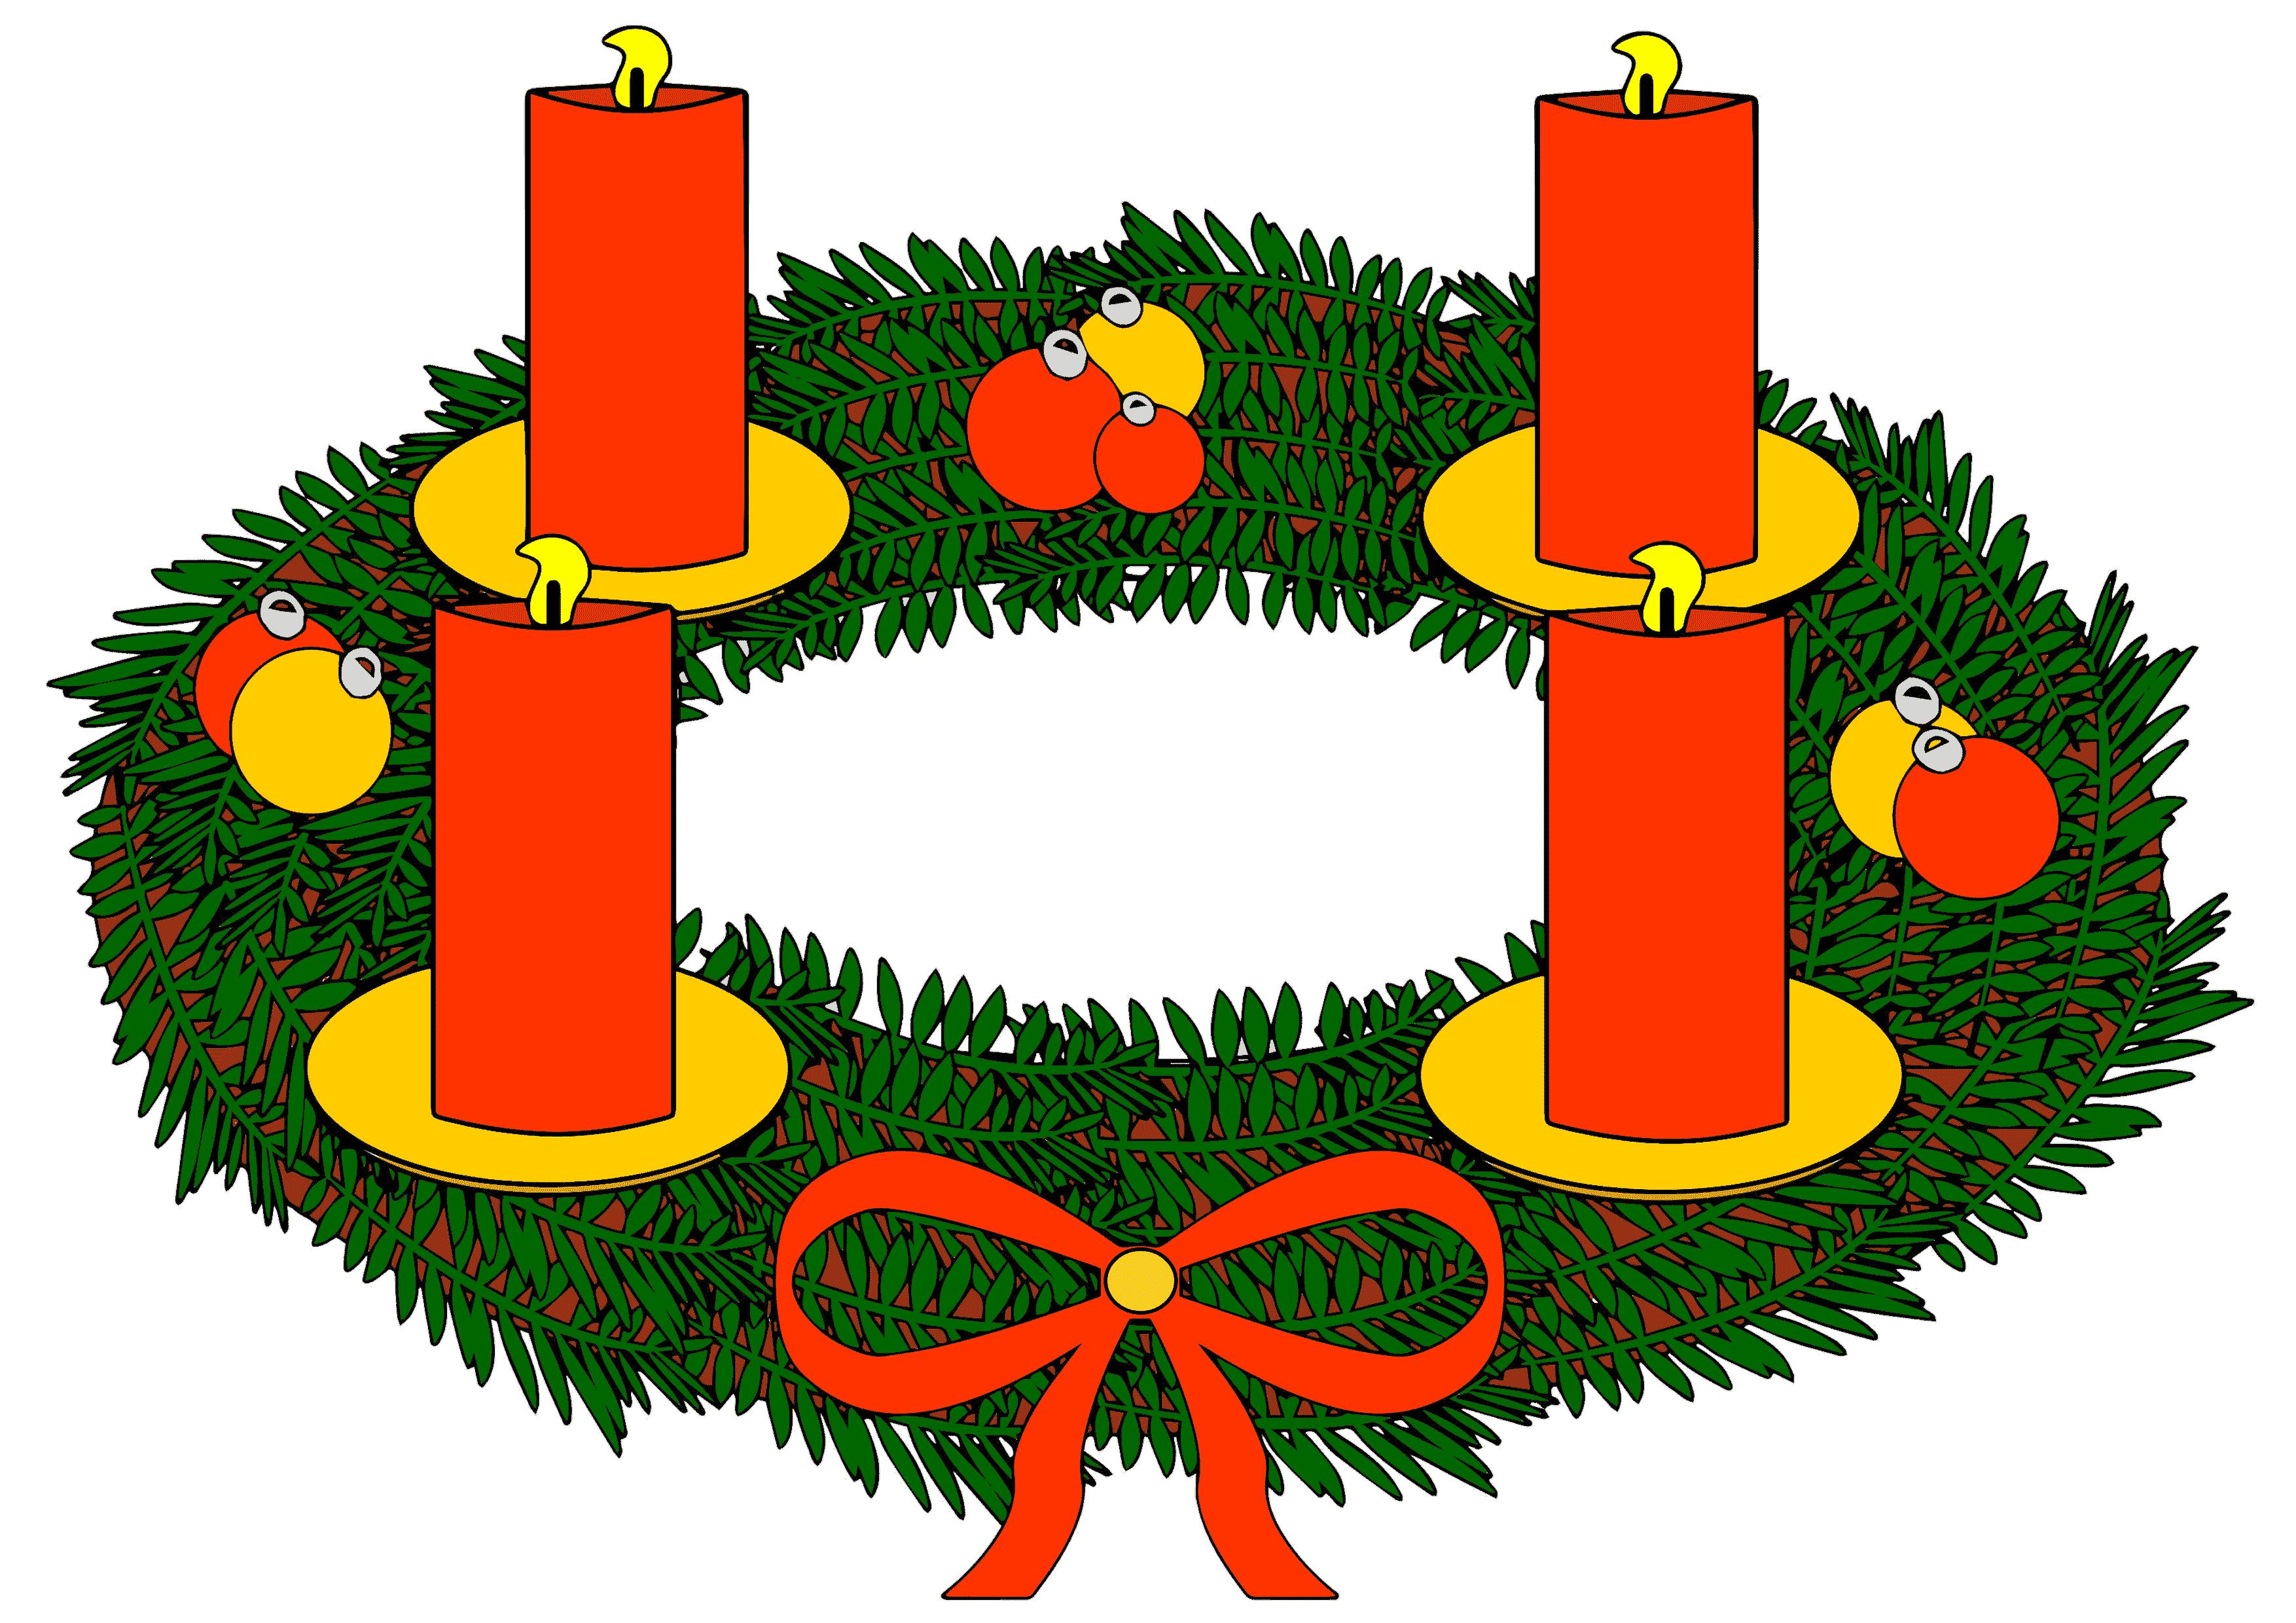 Adventskranz 1. Advent Clipart.